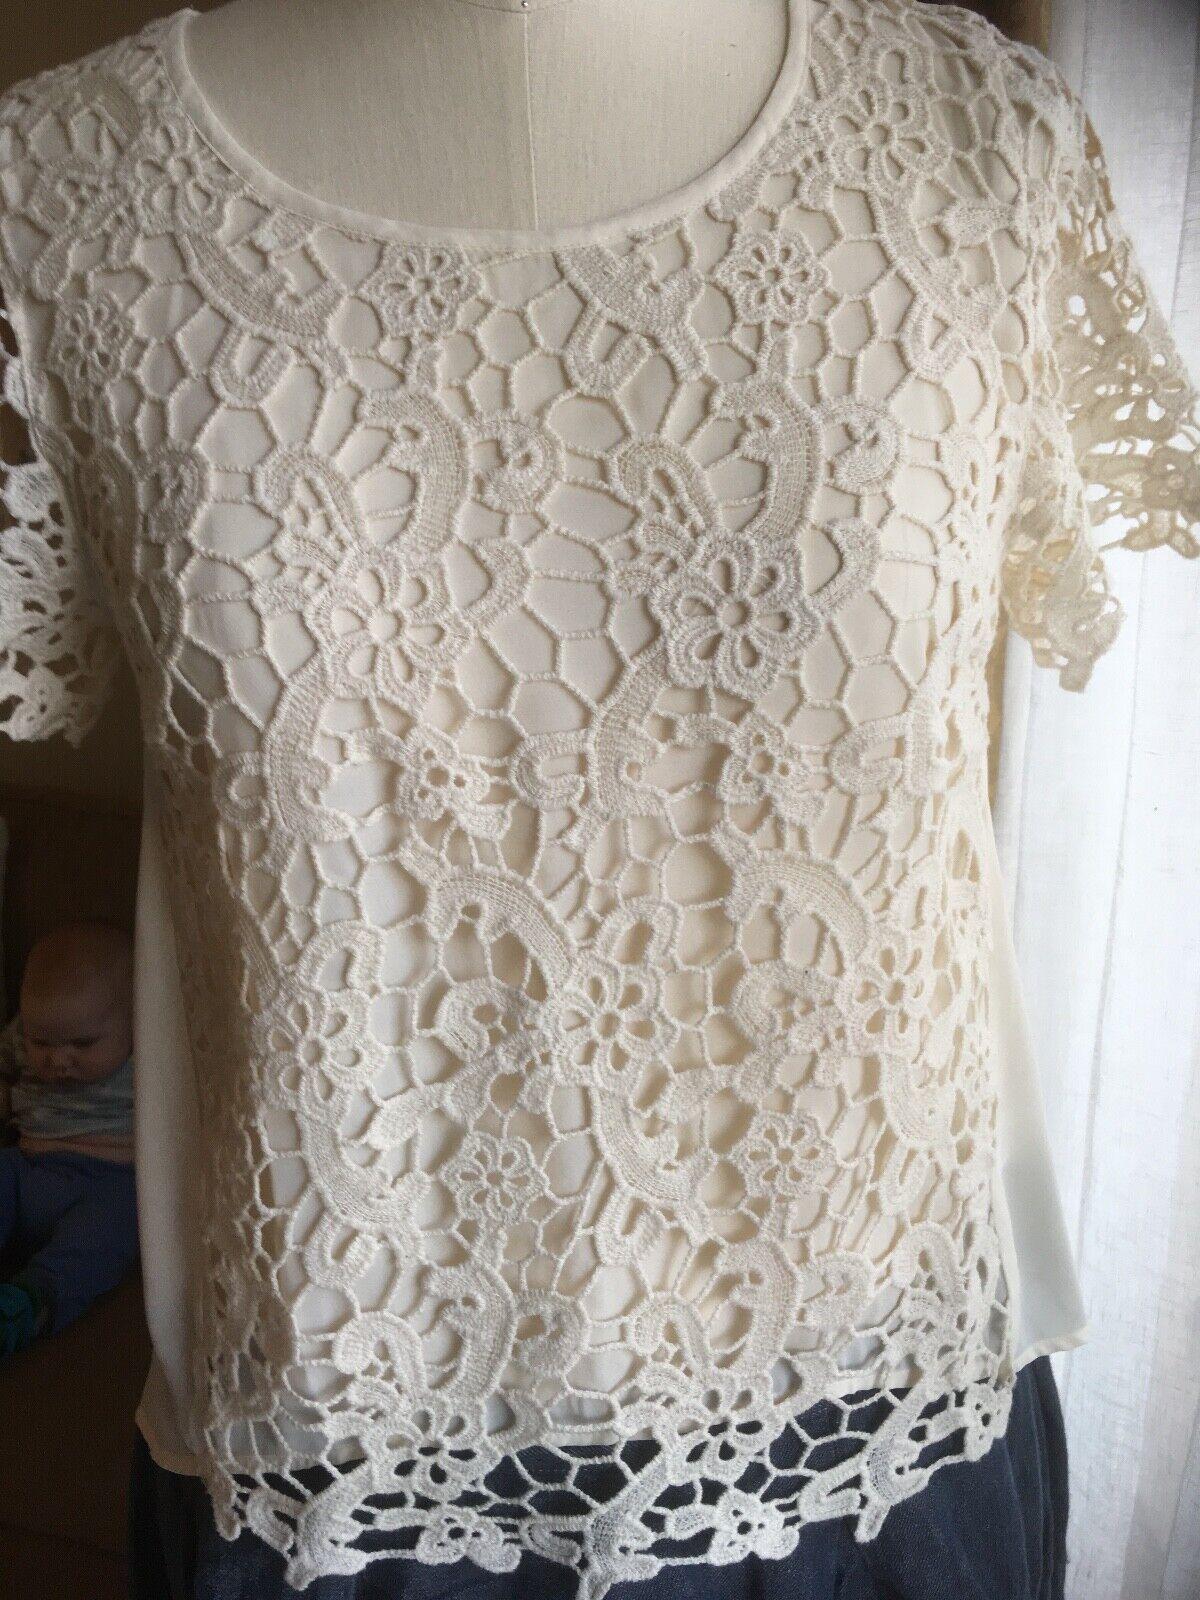 Sundance Catalog Ecru Lace Spring Summer High-Low Shirt Size M